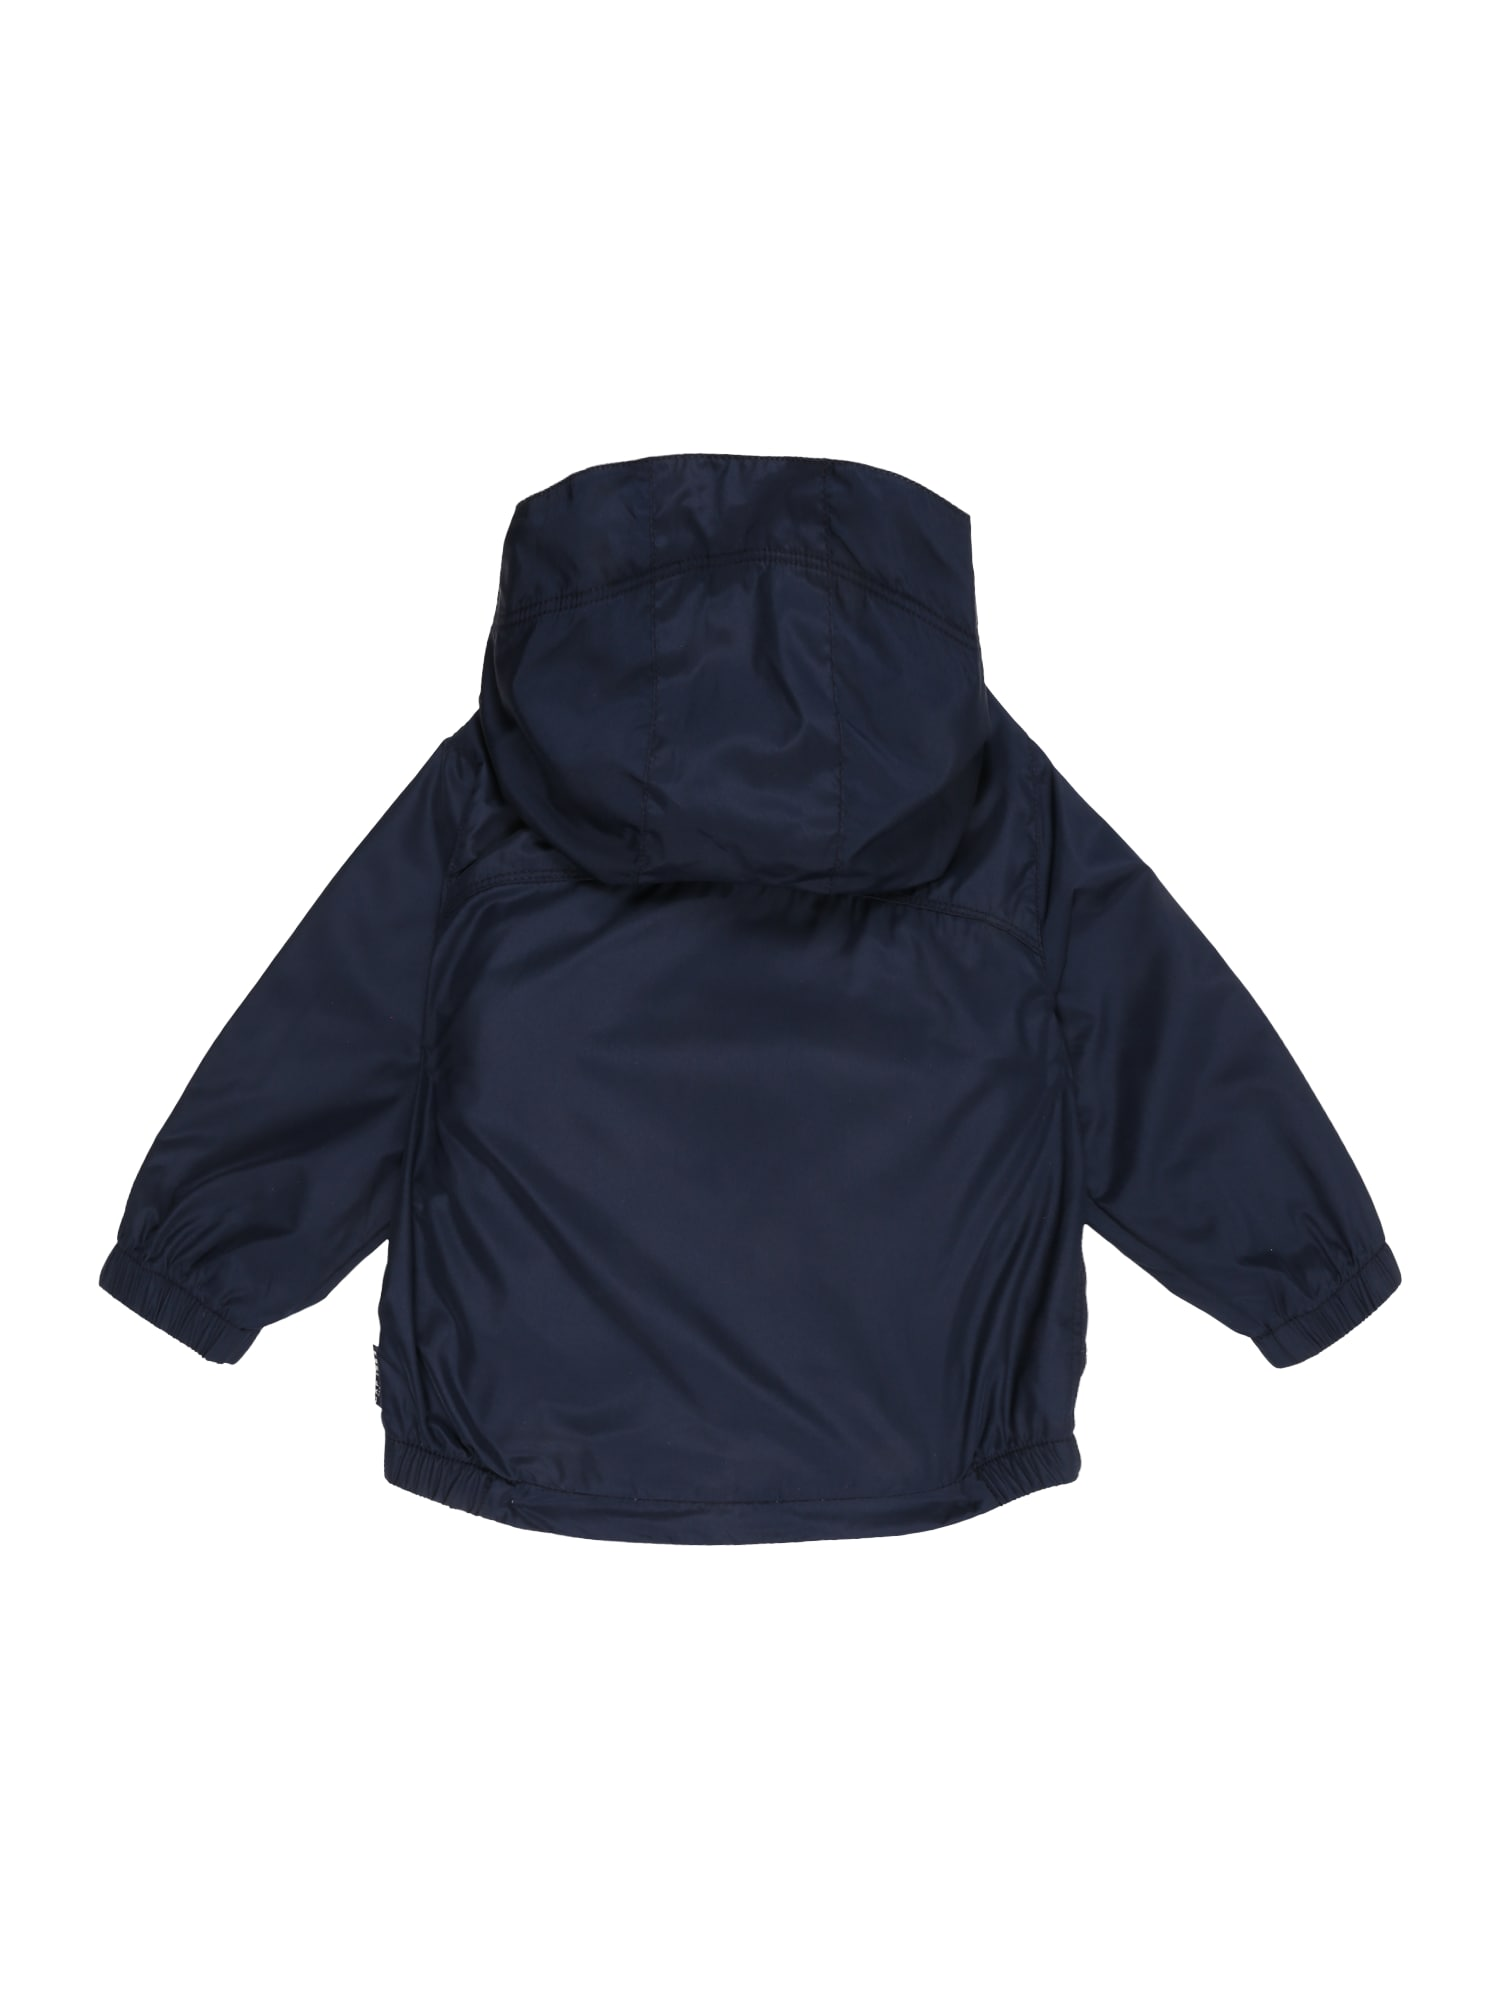 GAP Kinder,Jungen Übergangsjacke mit Jersey-Futter blau | 00500016189947